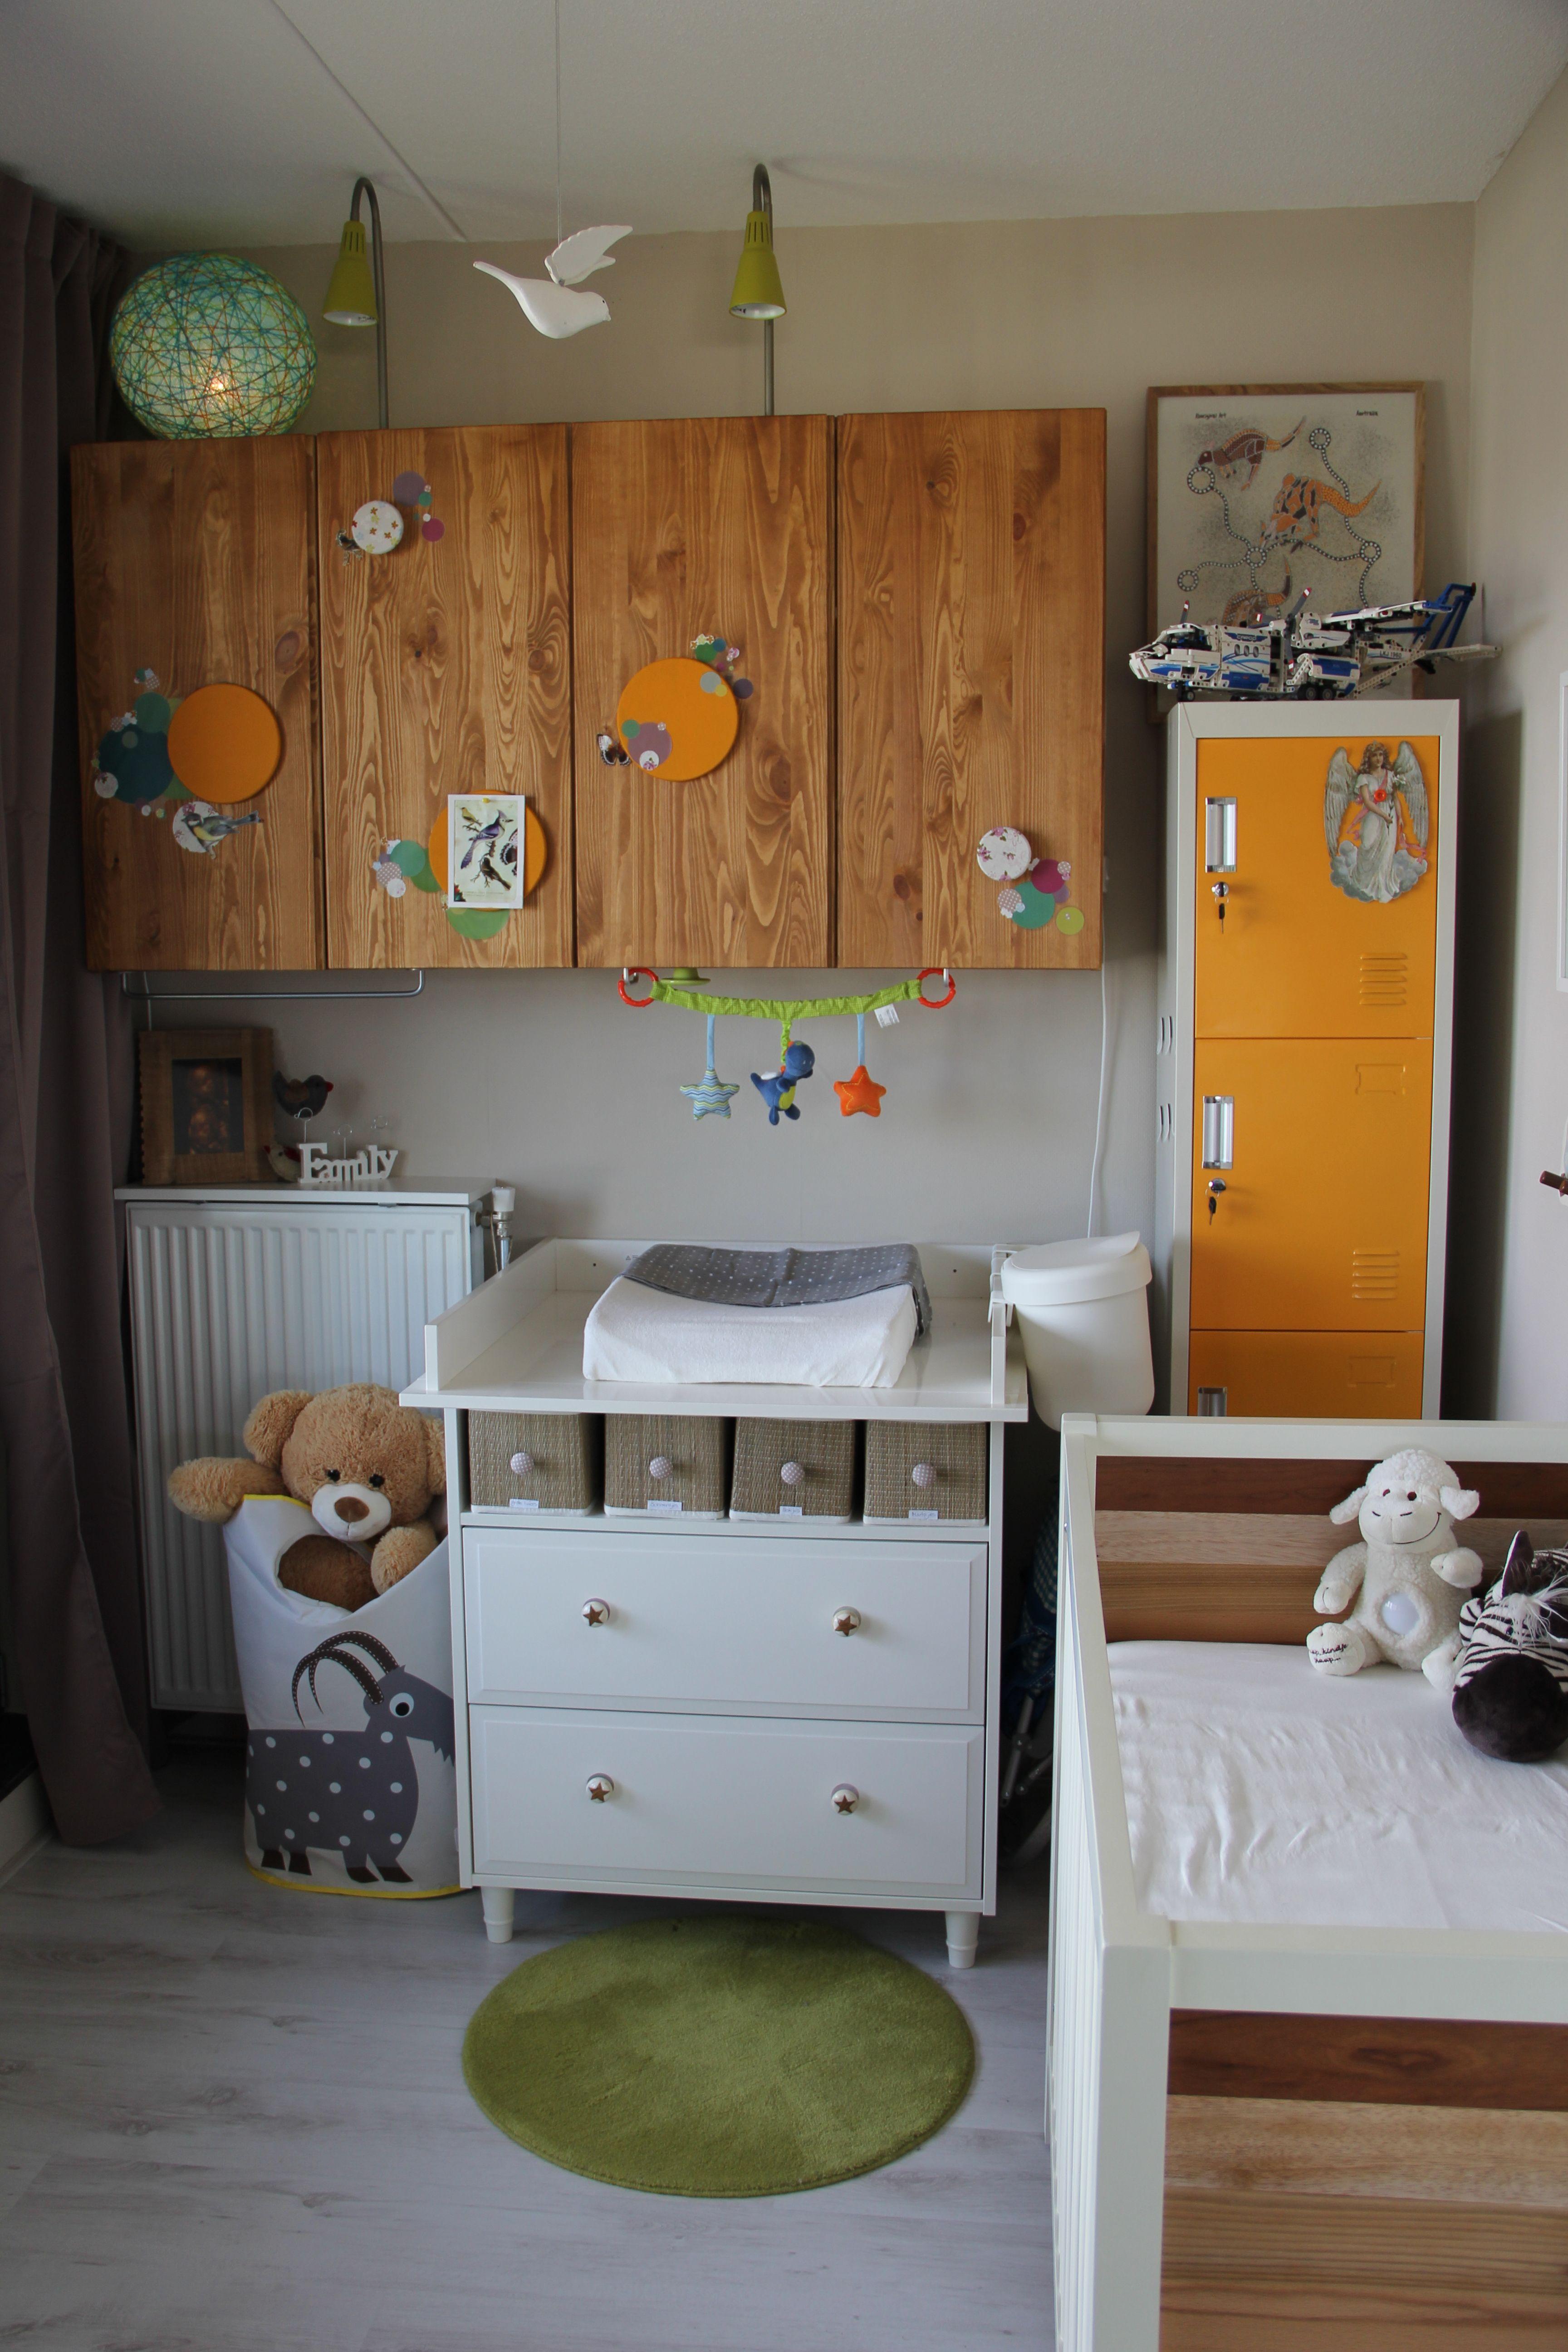 Small Nursery No Closet Needed In A Small Room Use Cabinets Van Ikea Ivar As An Alternative Ikea Ivar Used Cabinets Small Nurseries